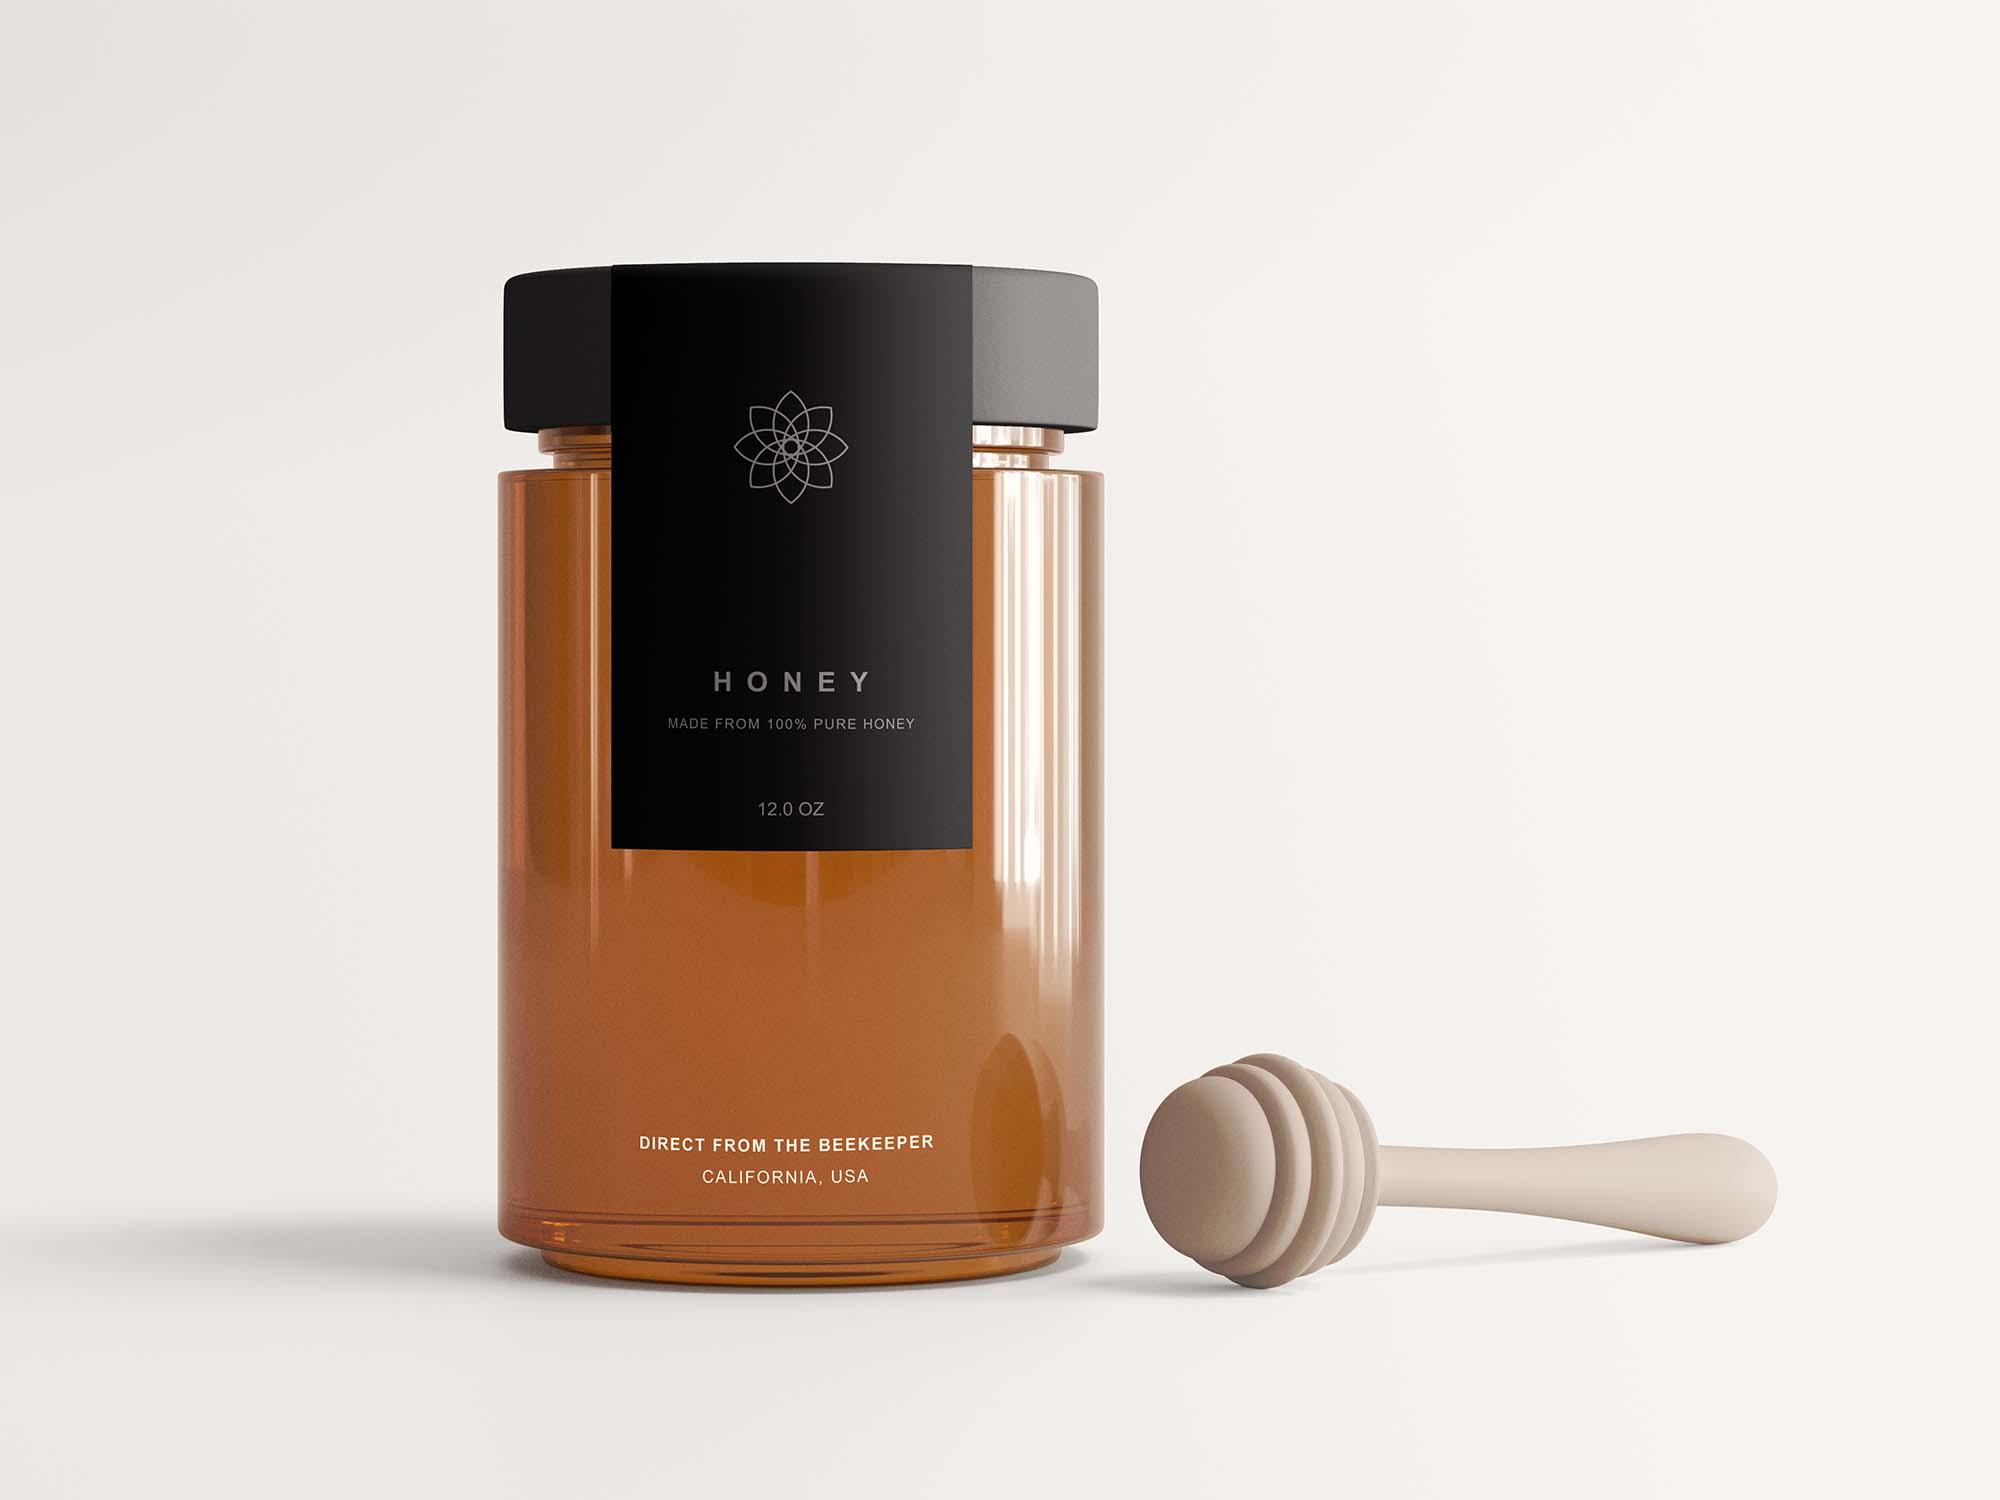 Honey Jar with Spinner Mockup